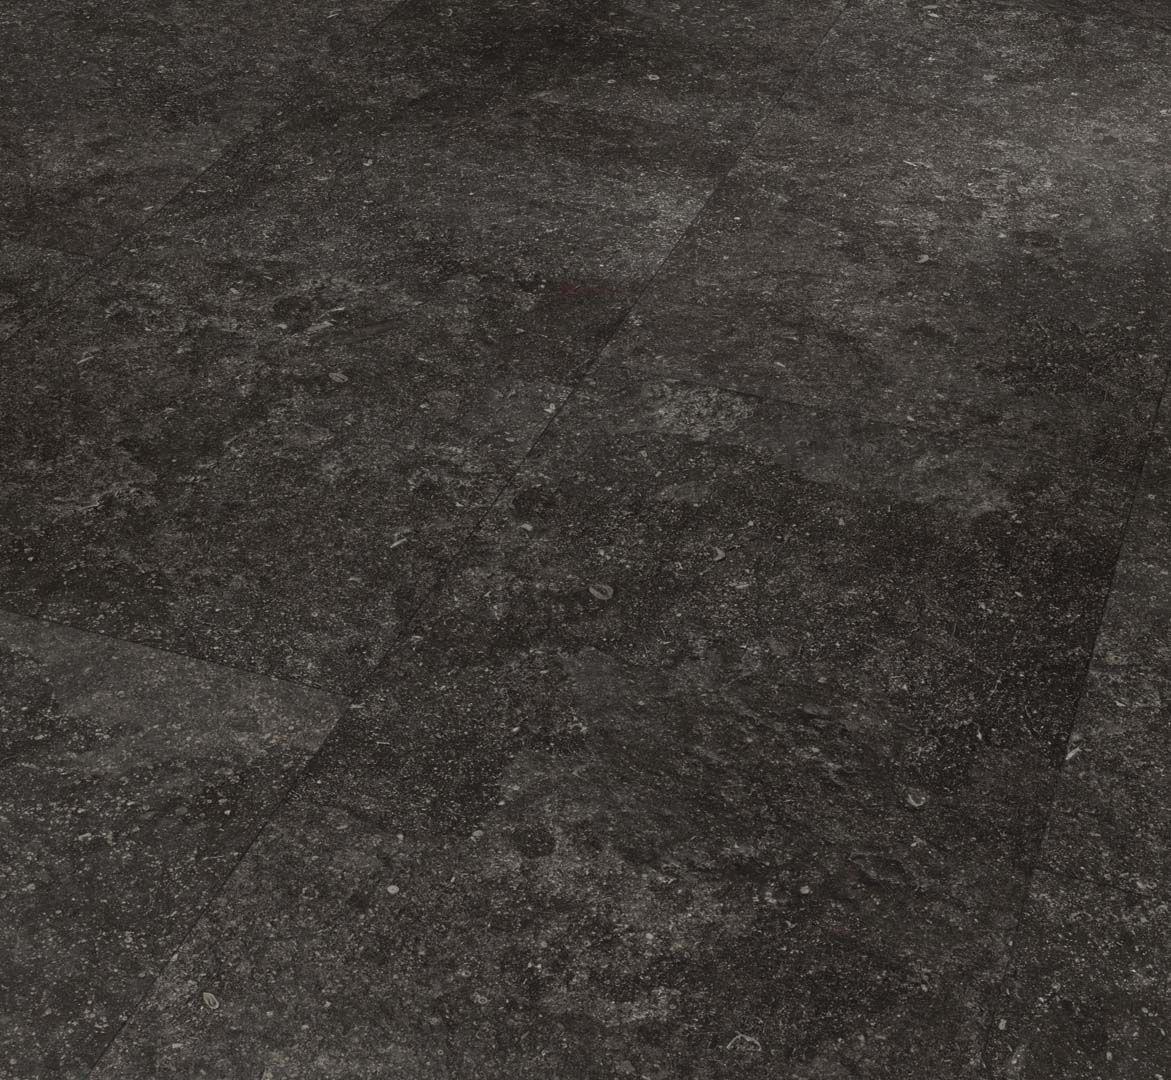 Graniet antraciet